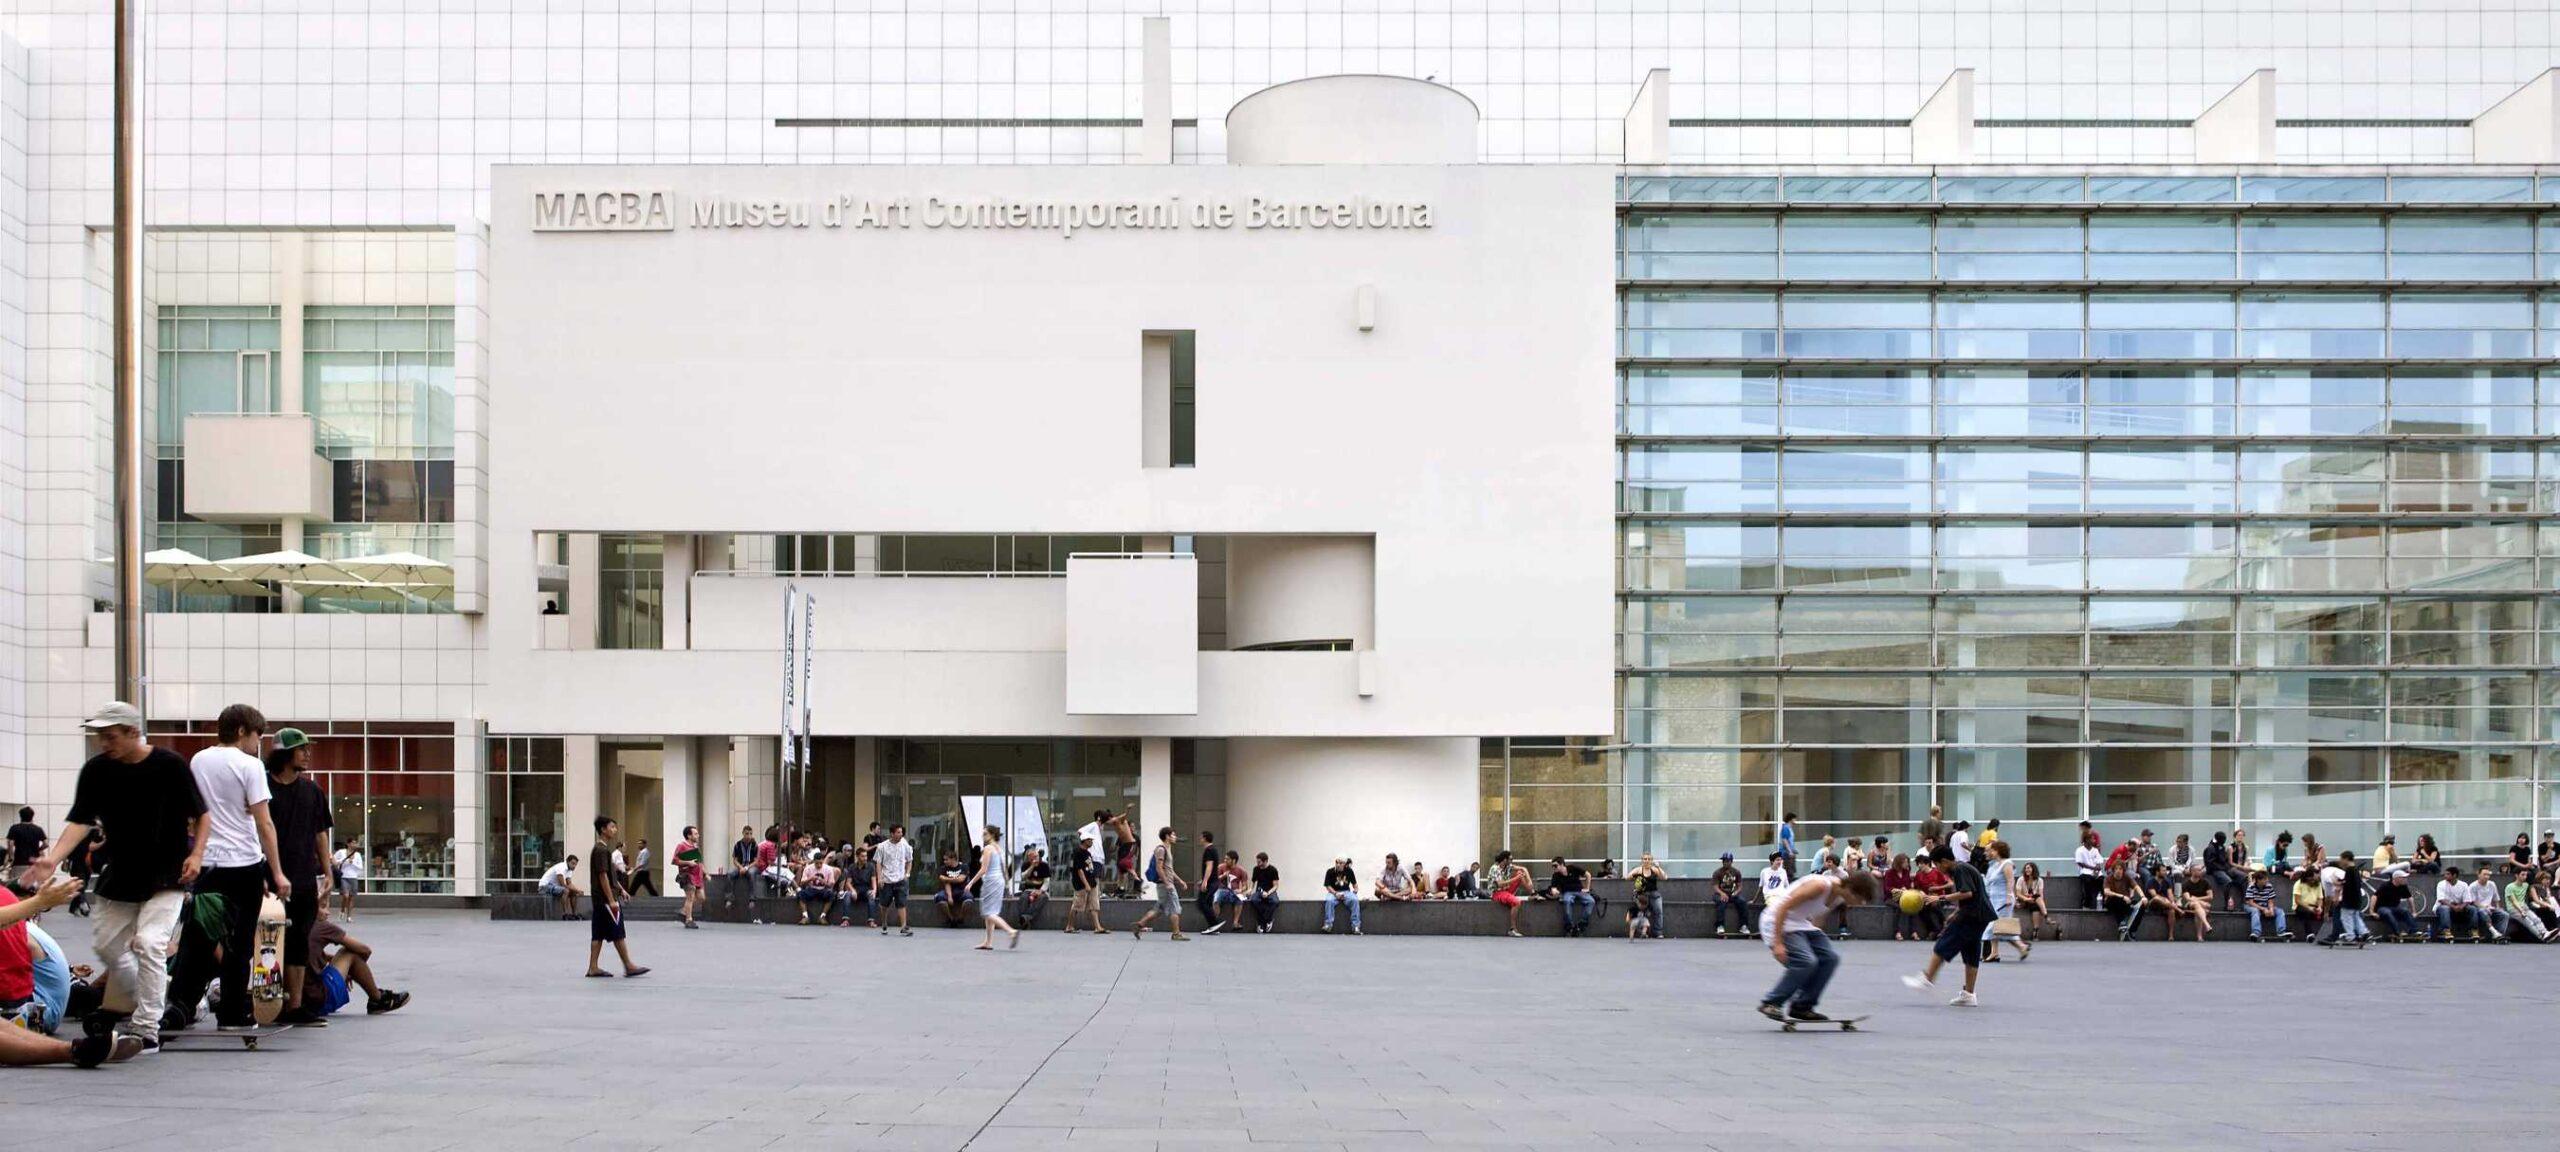 ART_MACBA_Barcelona-creating-new-space-Rafael-Vargas-3005